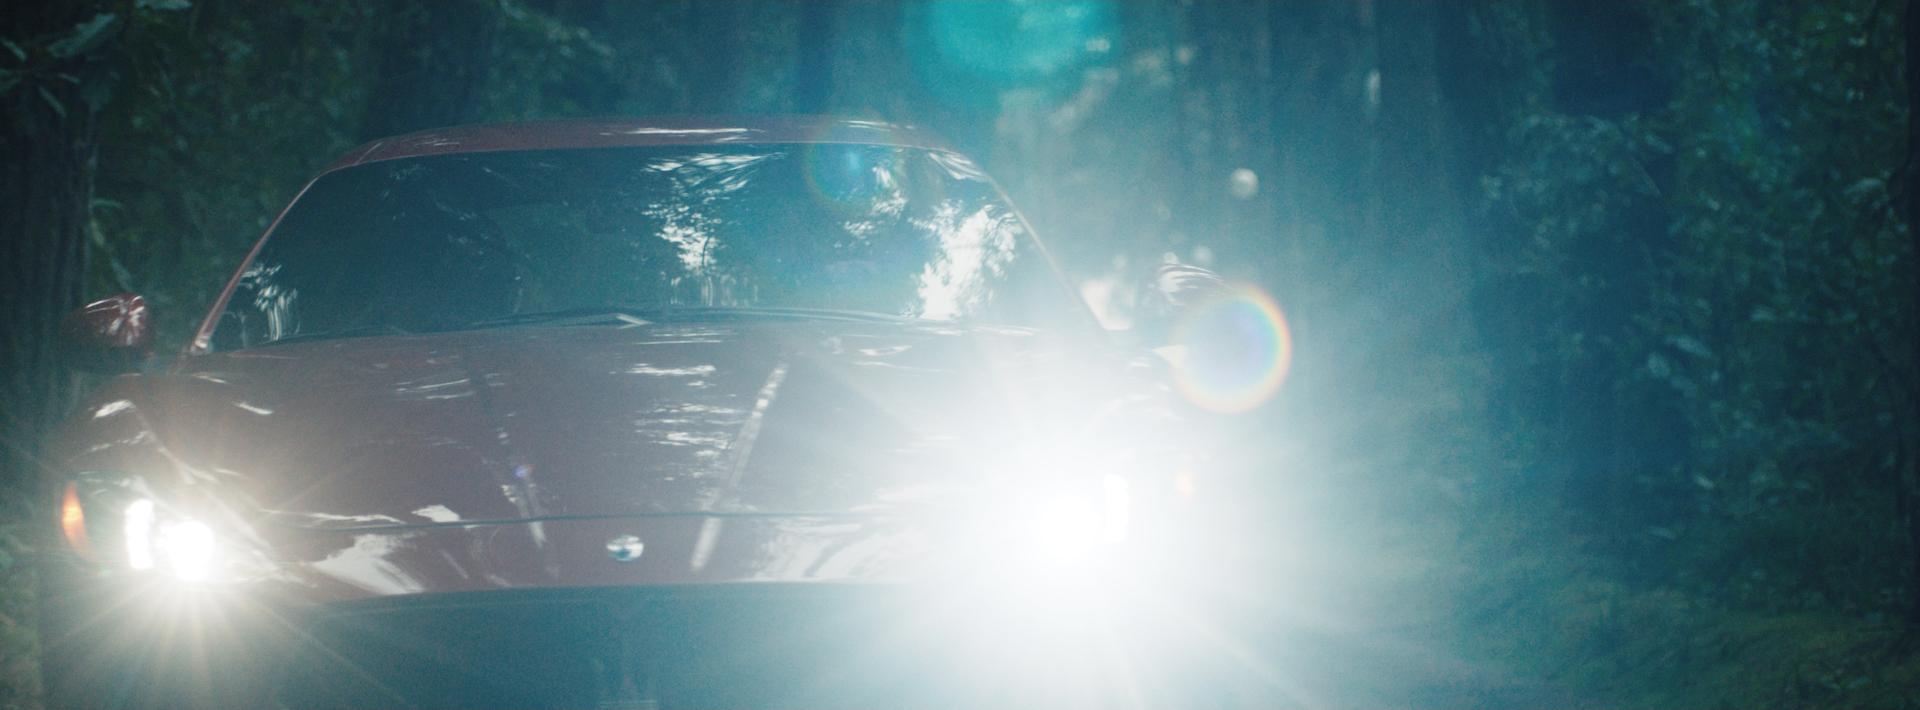 Maserati_1.174.2 copy.jpg